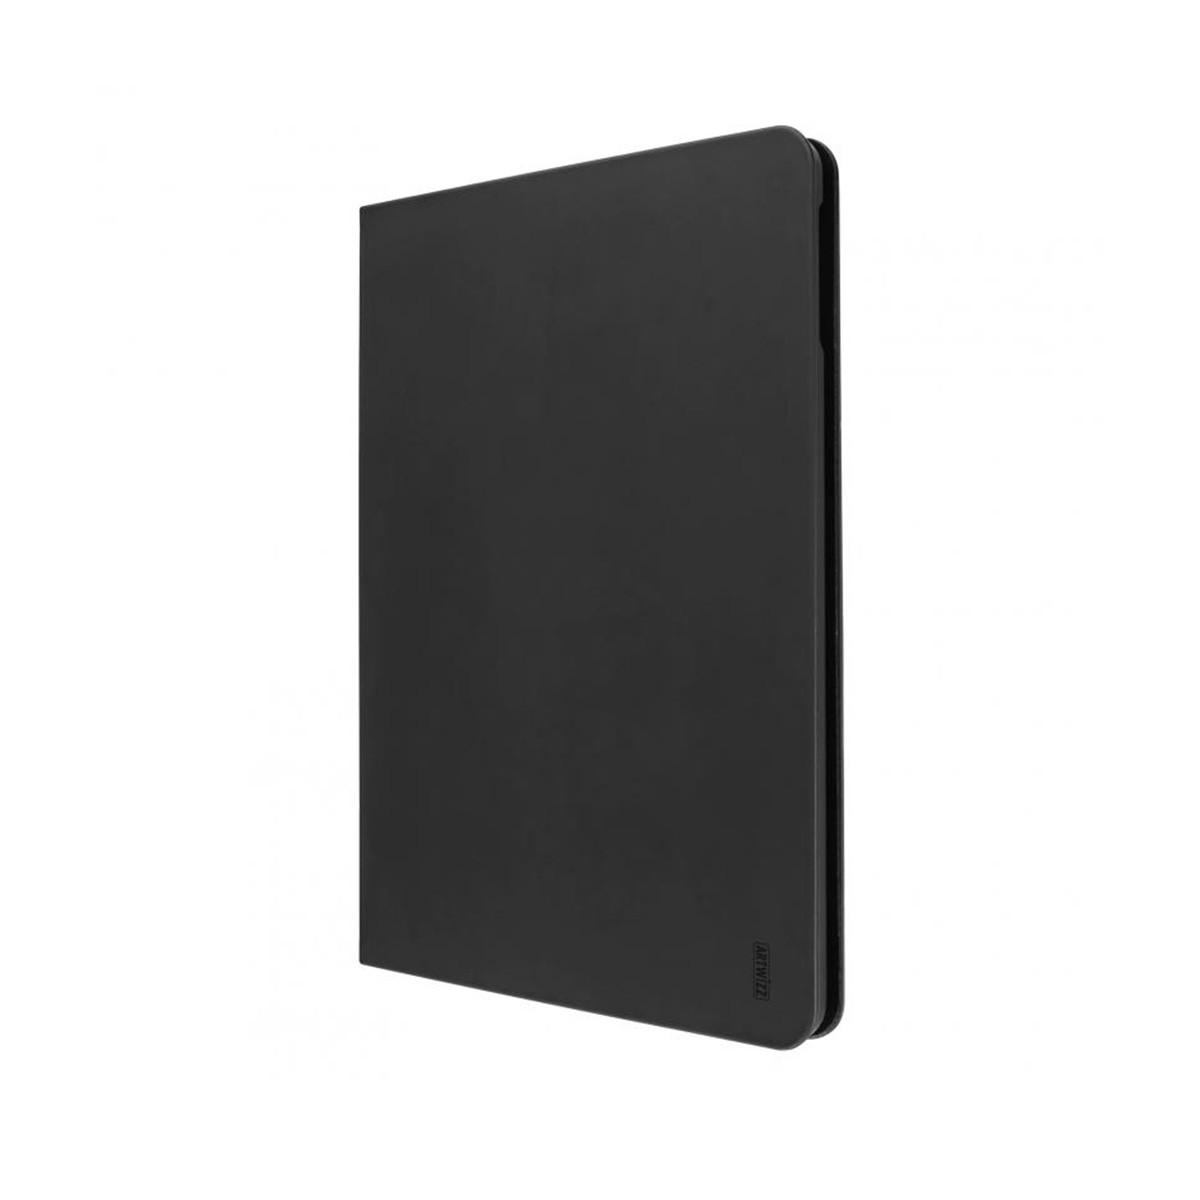 Artwizz SeeJacket, černý kryt pro iPad Air 2